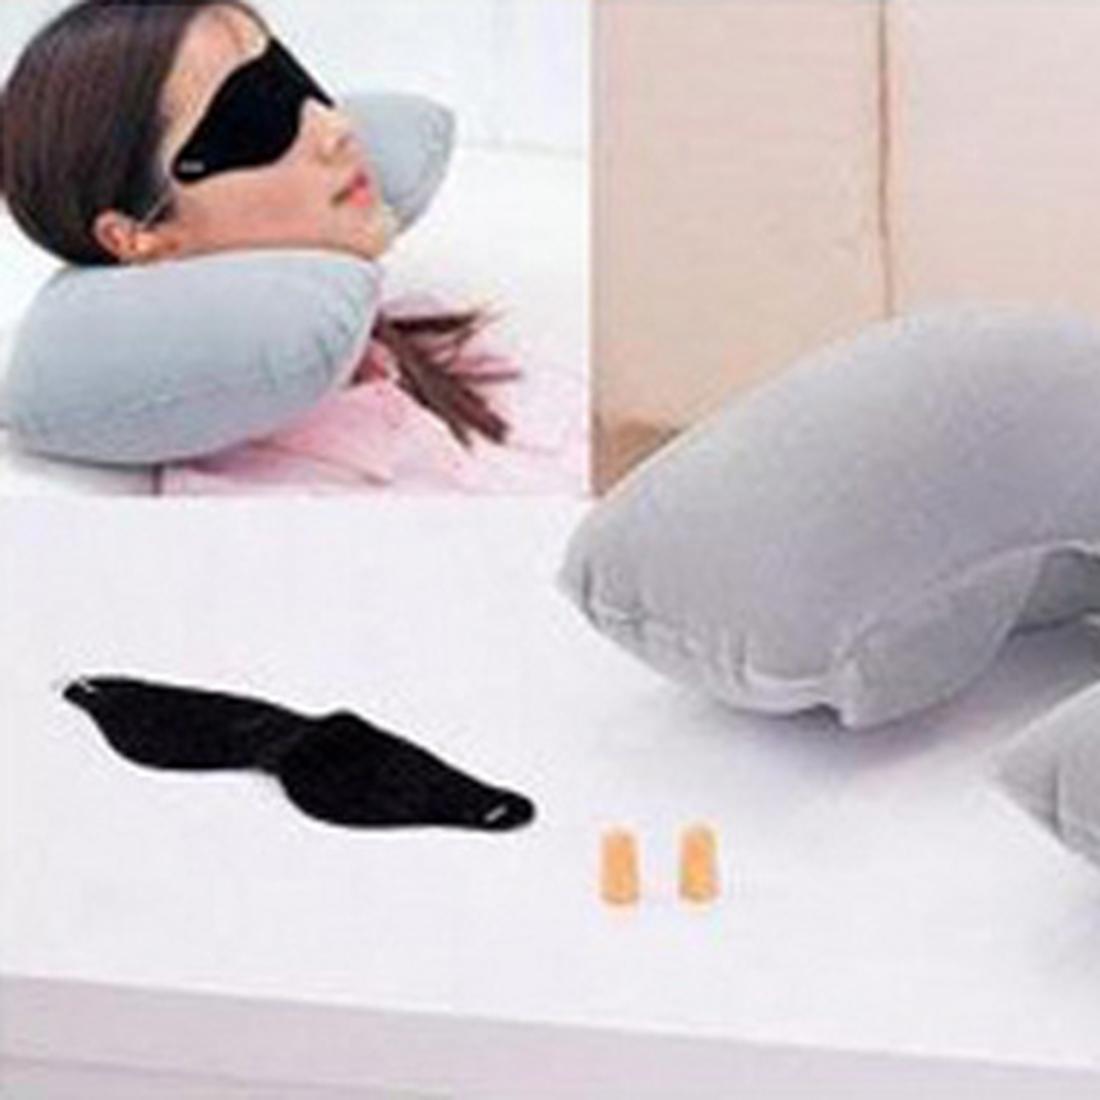 New U neck pillow travel pillow Flight Car Pillow Inflatable pillow Neck U Rest Air Cushion+ Eye Mask + Earbuds Free Shipping(China (Mainland))